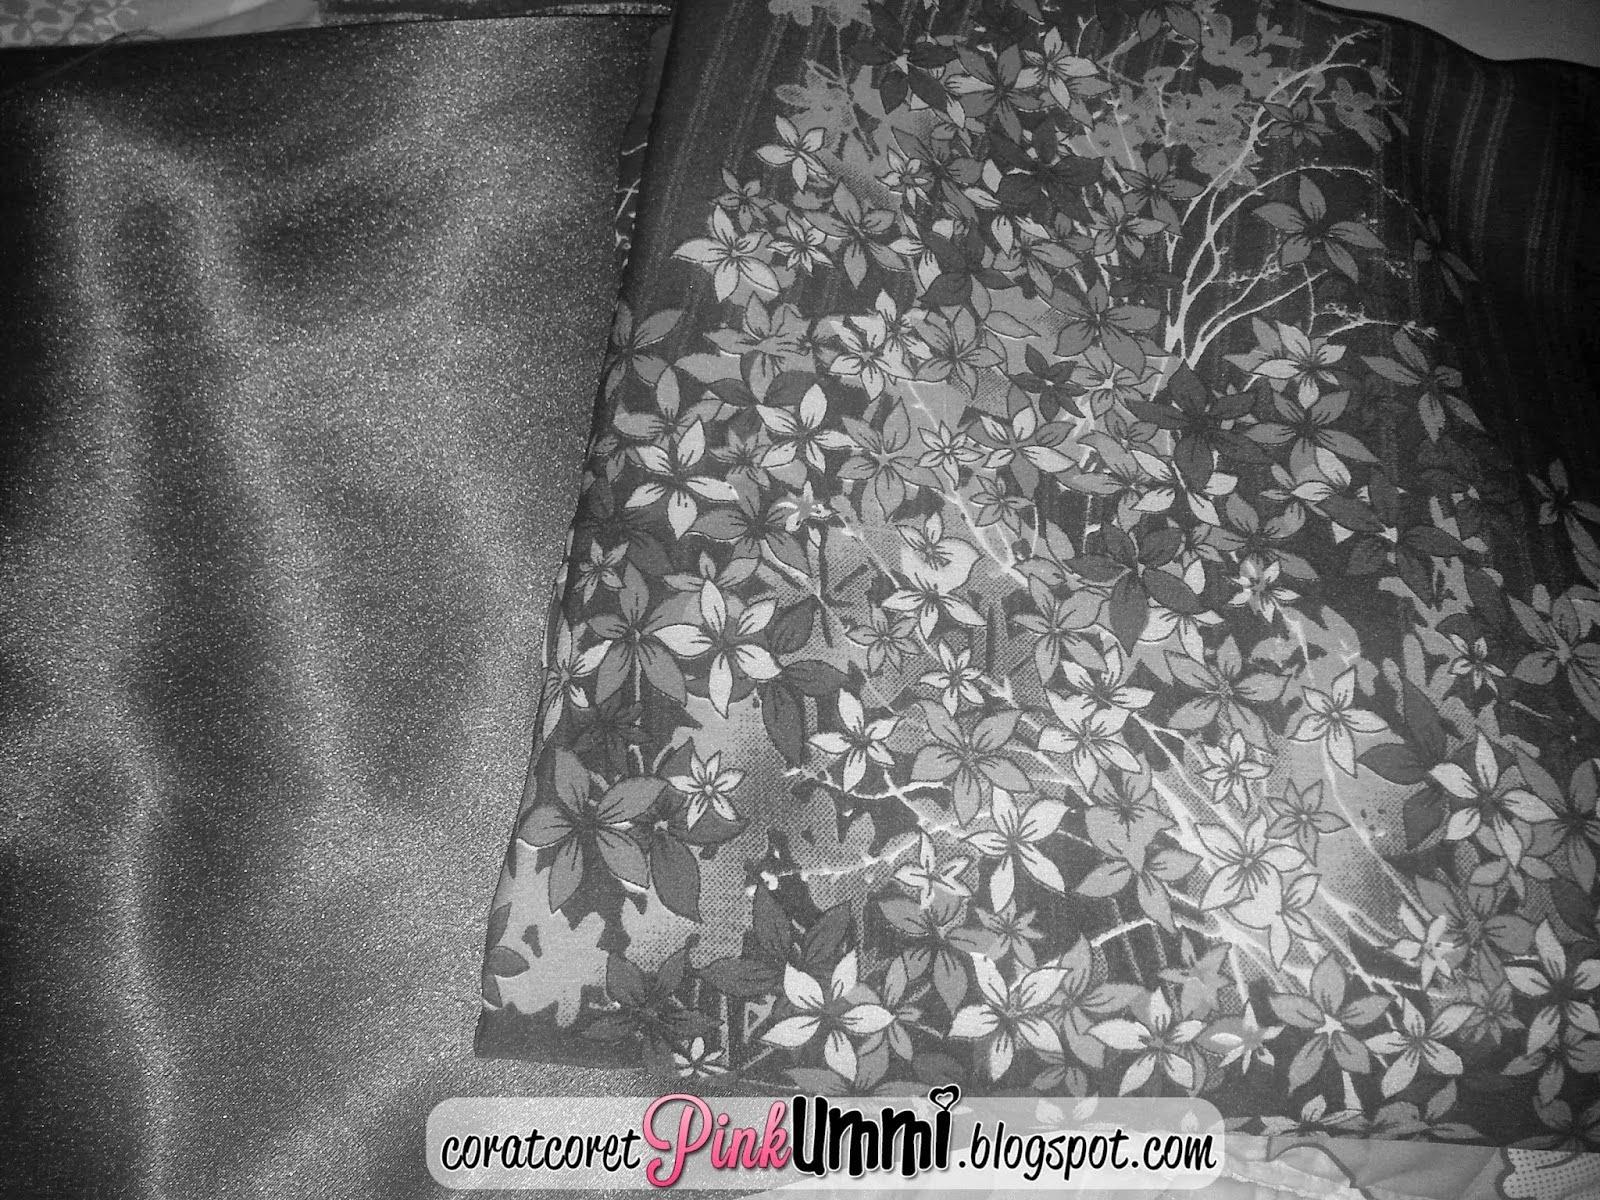 http://coratcoretpinkummi.blogspot.com/2014/05/giveaway-warna-tema-baju-raya.html